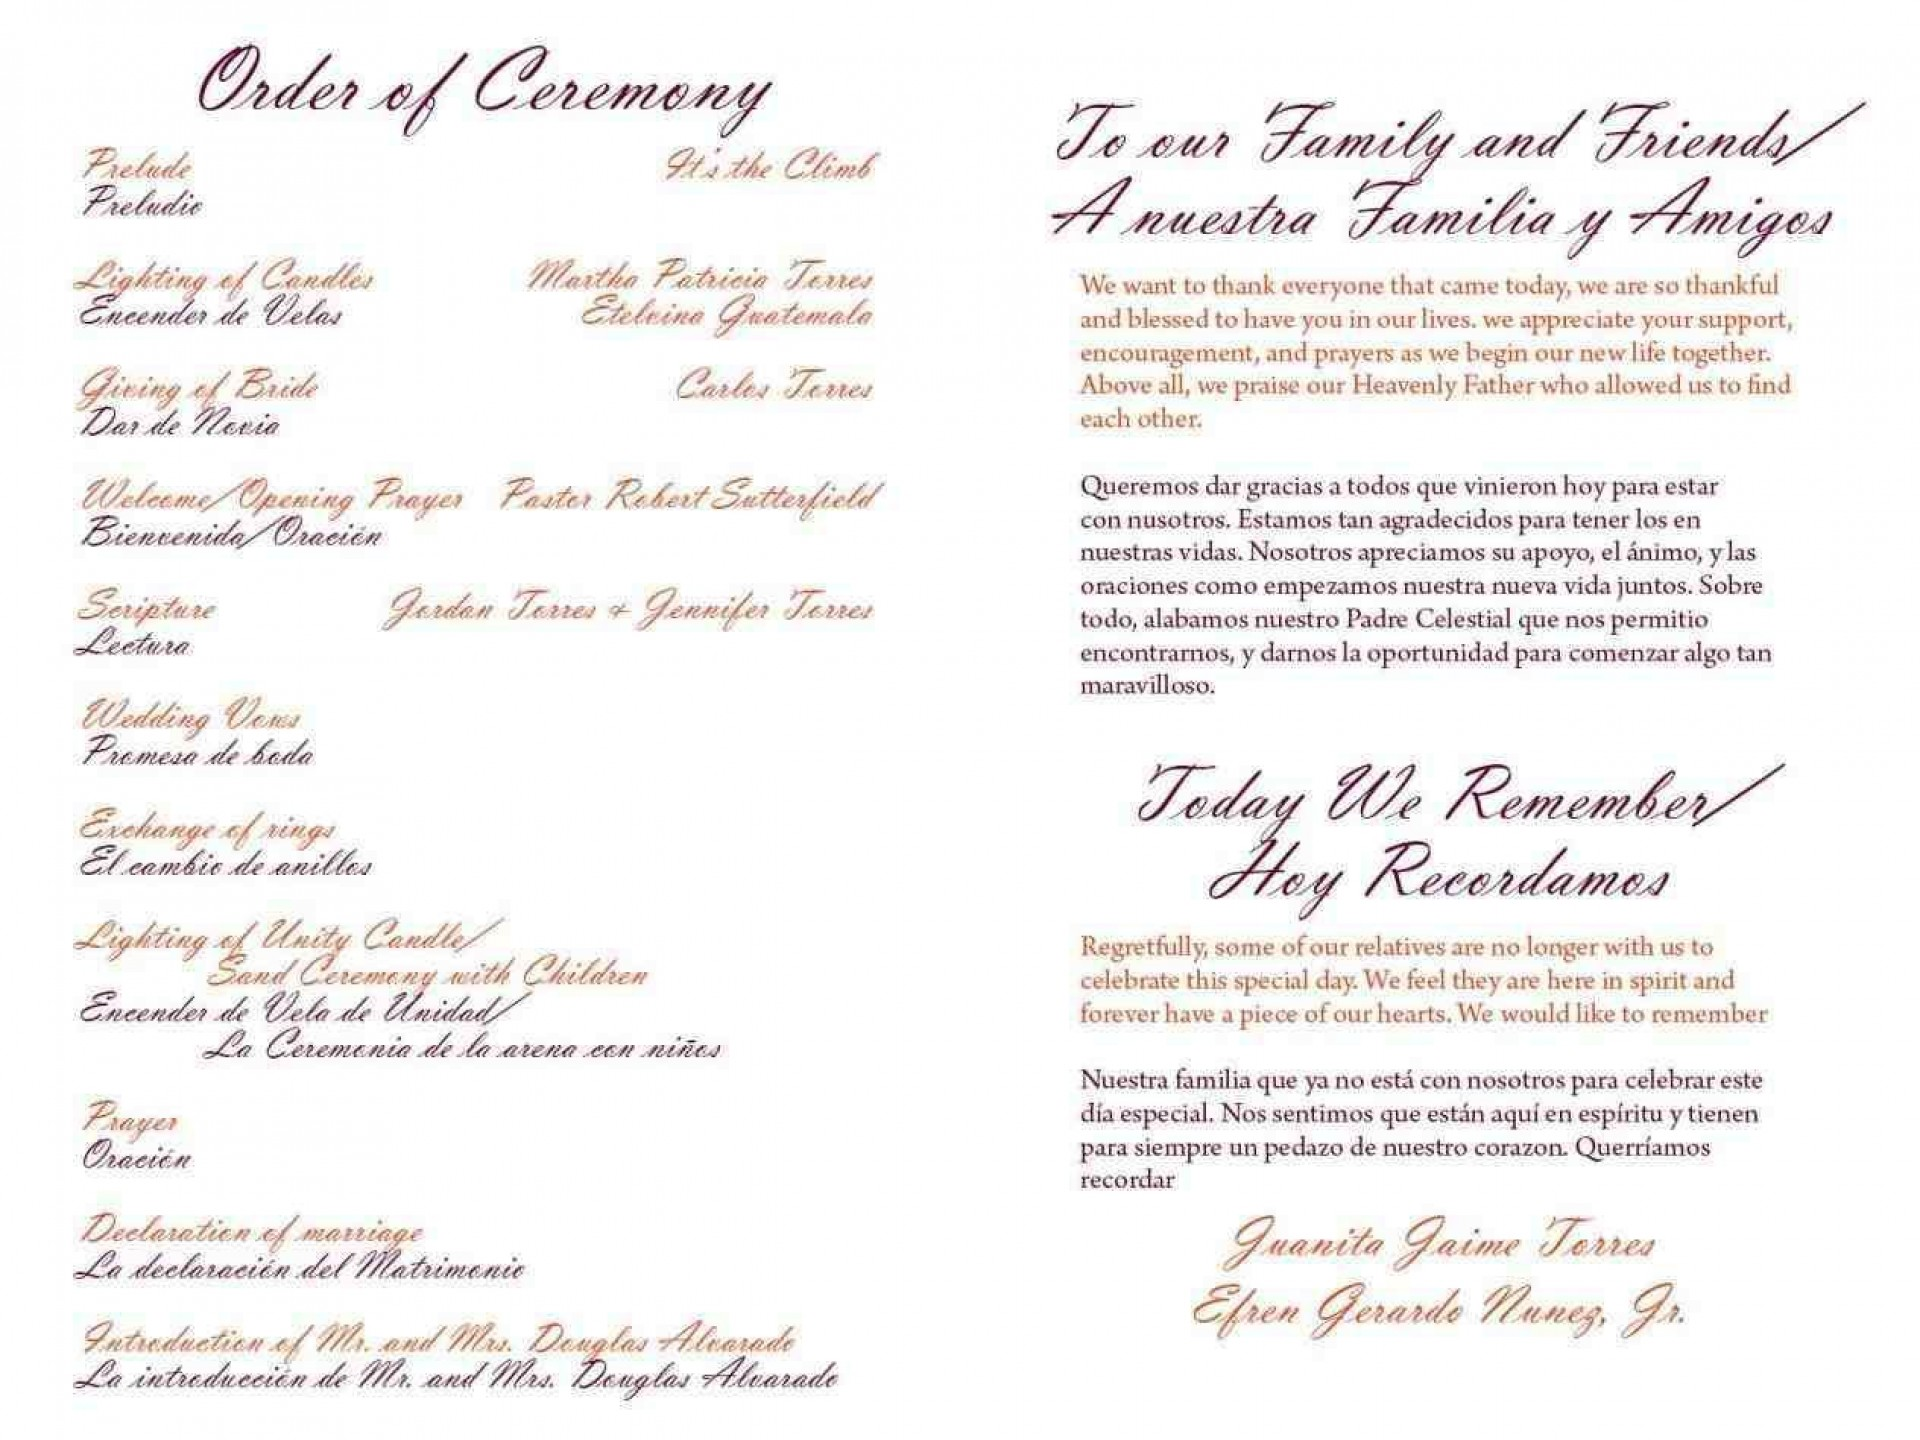 004 Wondrou One Page Wedding Program Template Example  Ceremony Free1920